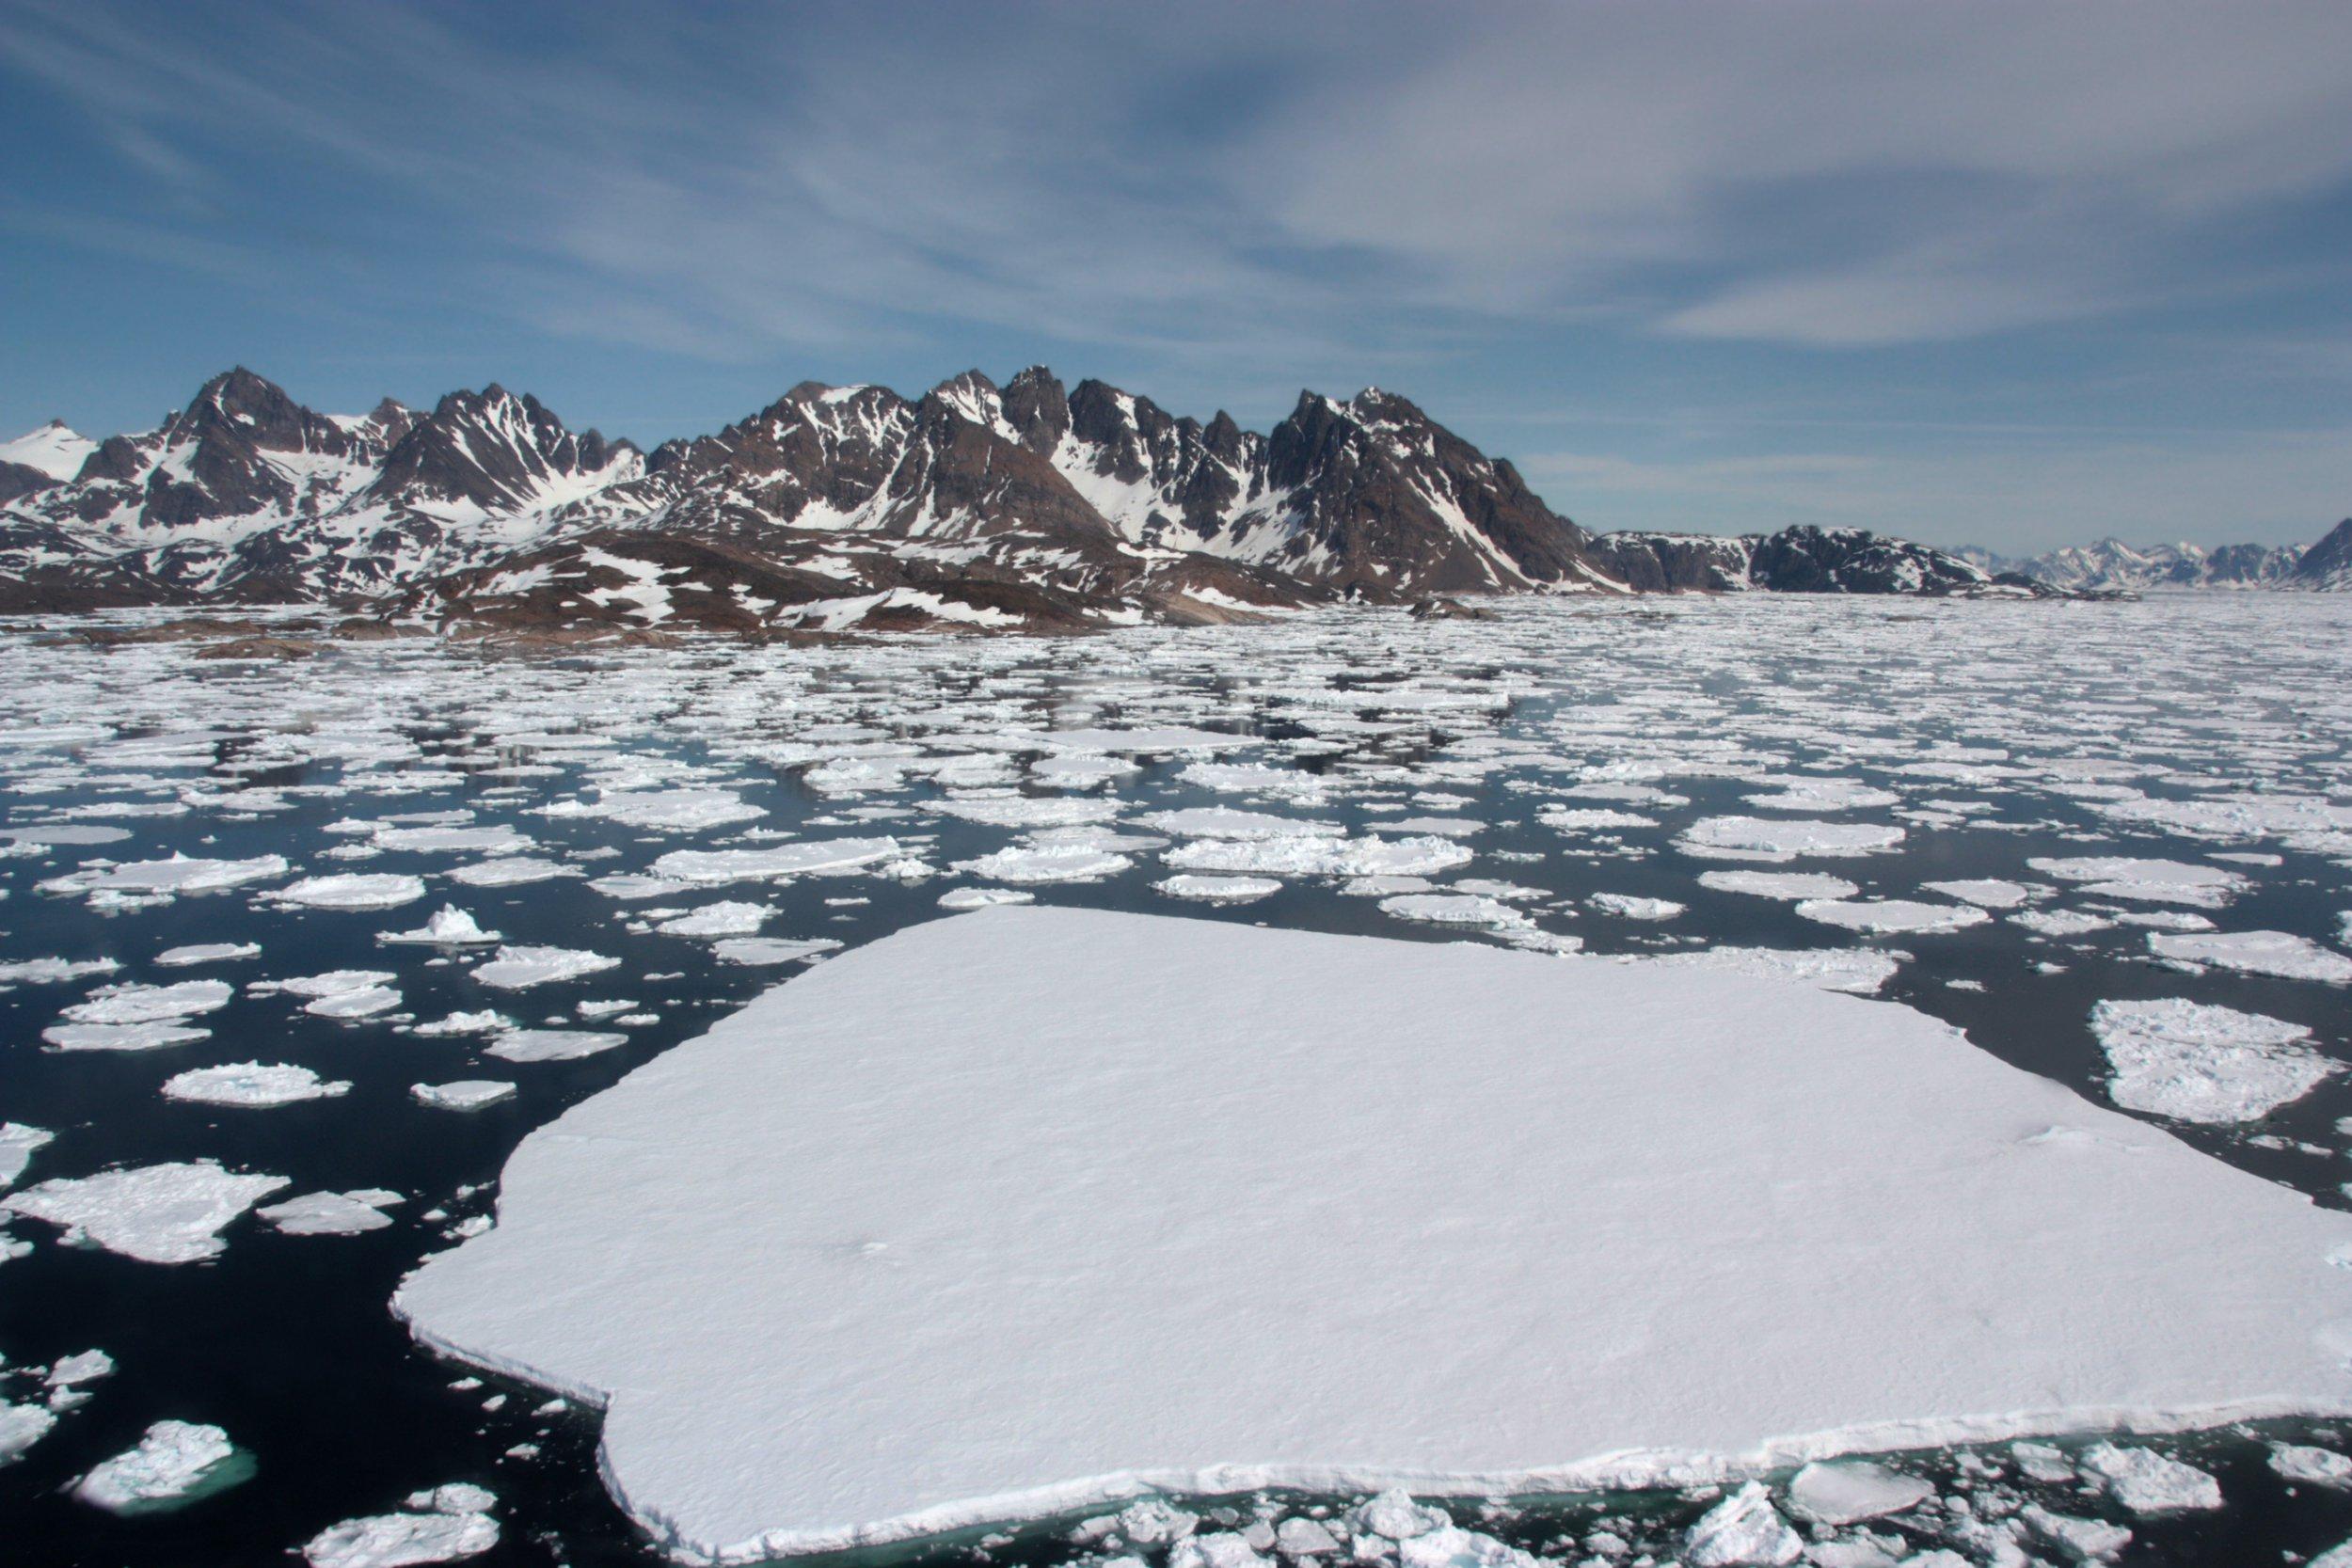 Sea ice breaking up in spring. Near Kulusuk, Greenland.